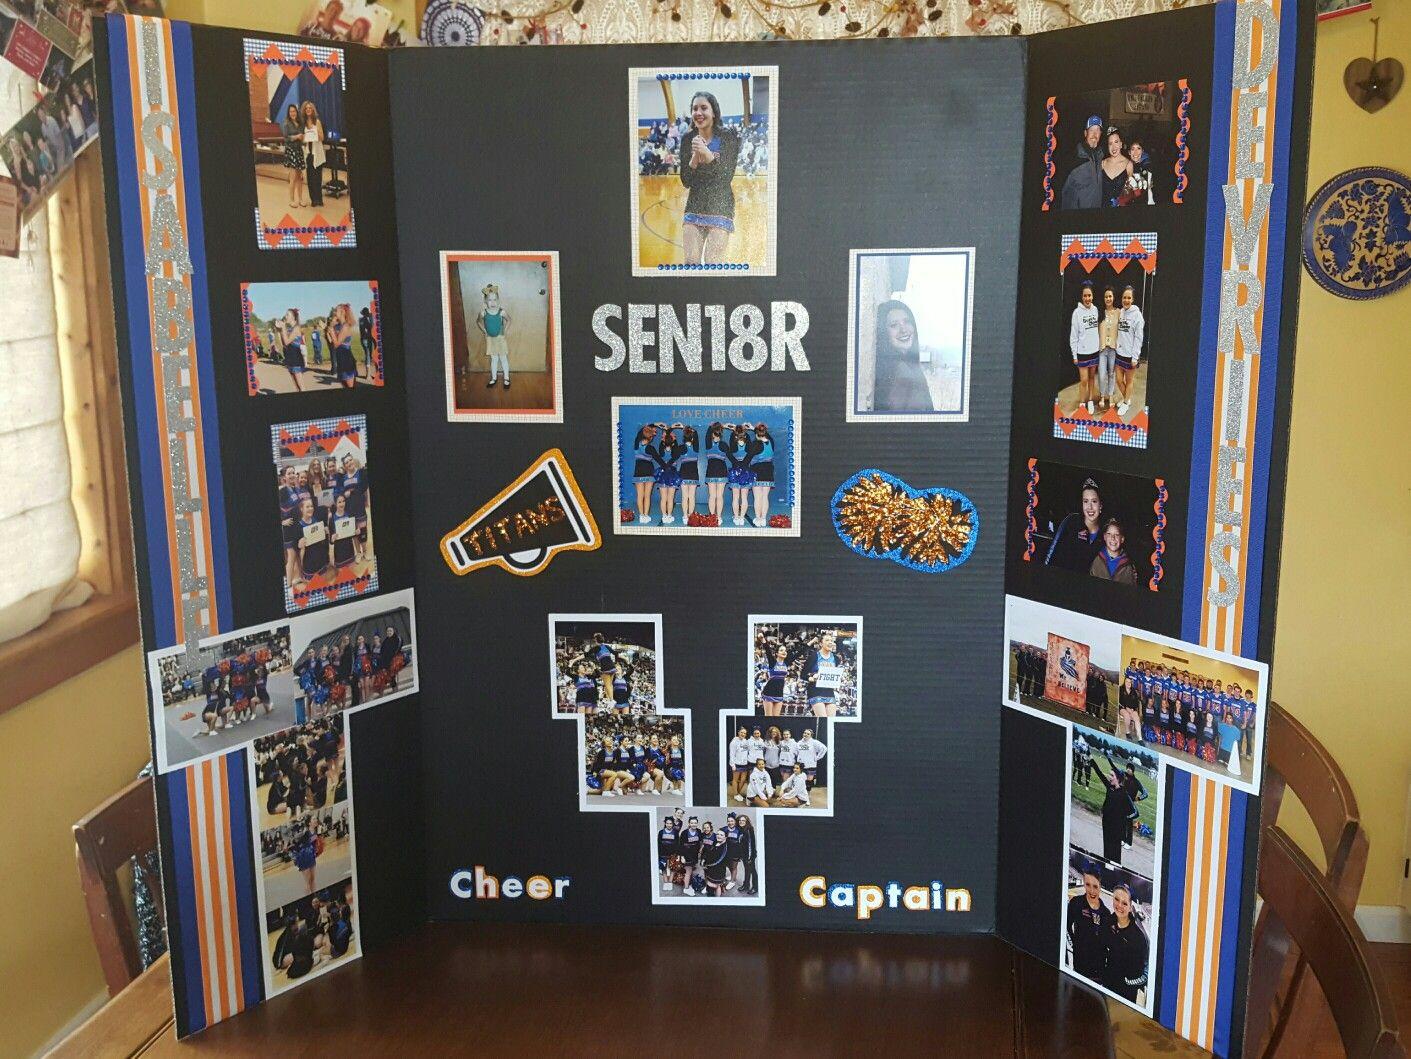 Cheerleader Senior Night Poster Trifold Senior Night Posters Senior Posters Volleyball Senior Night